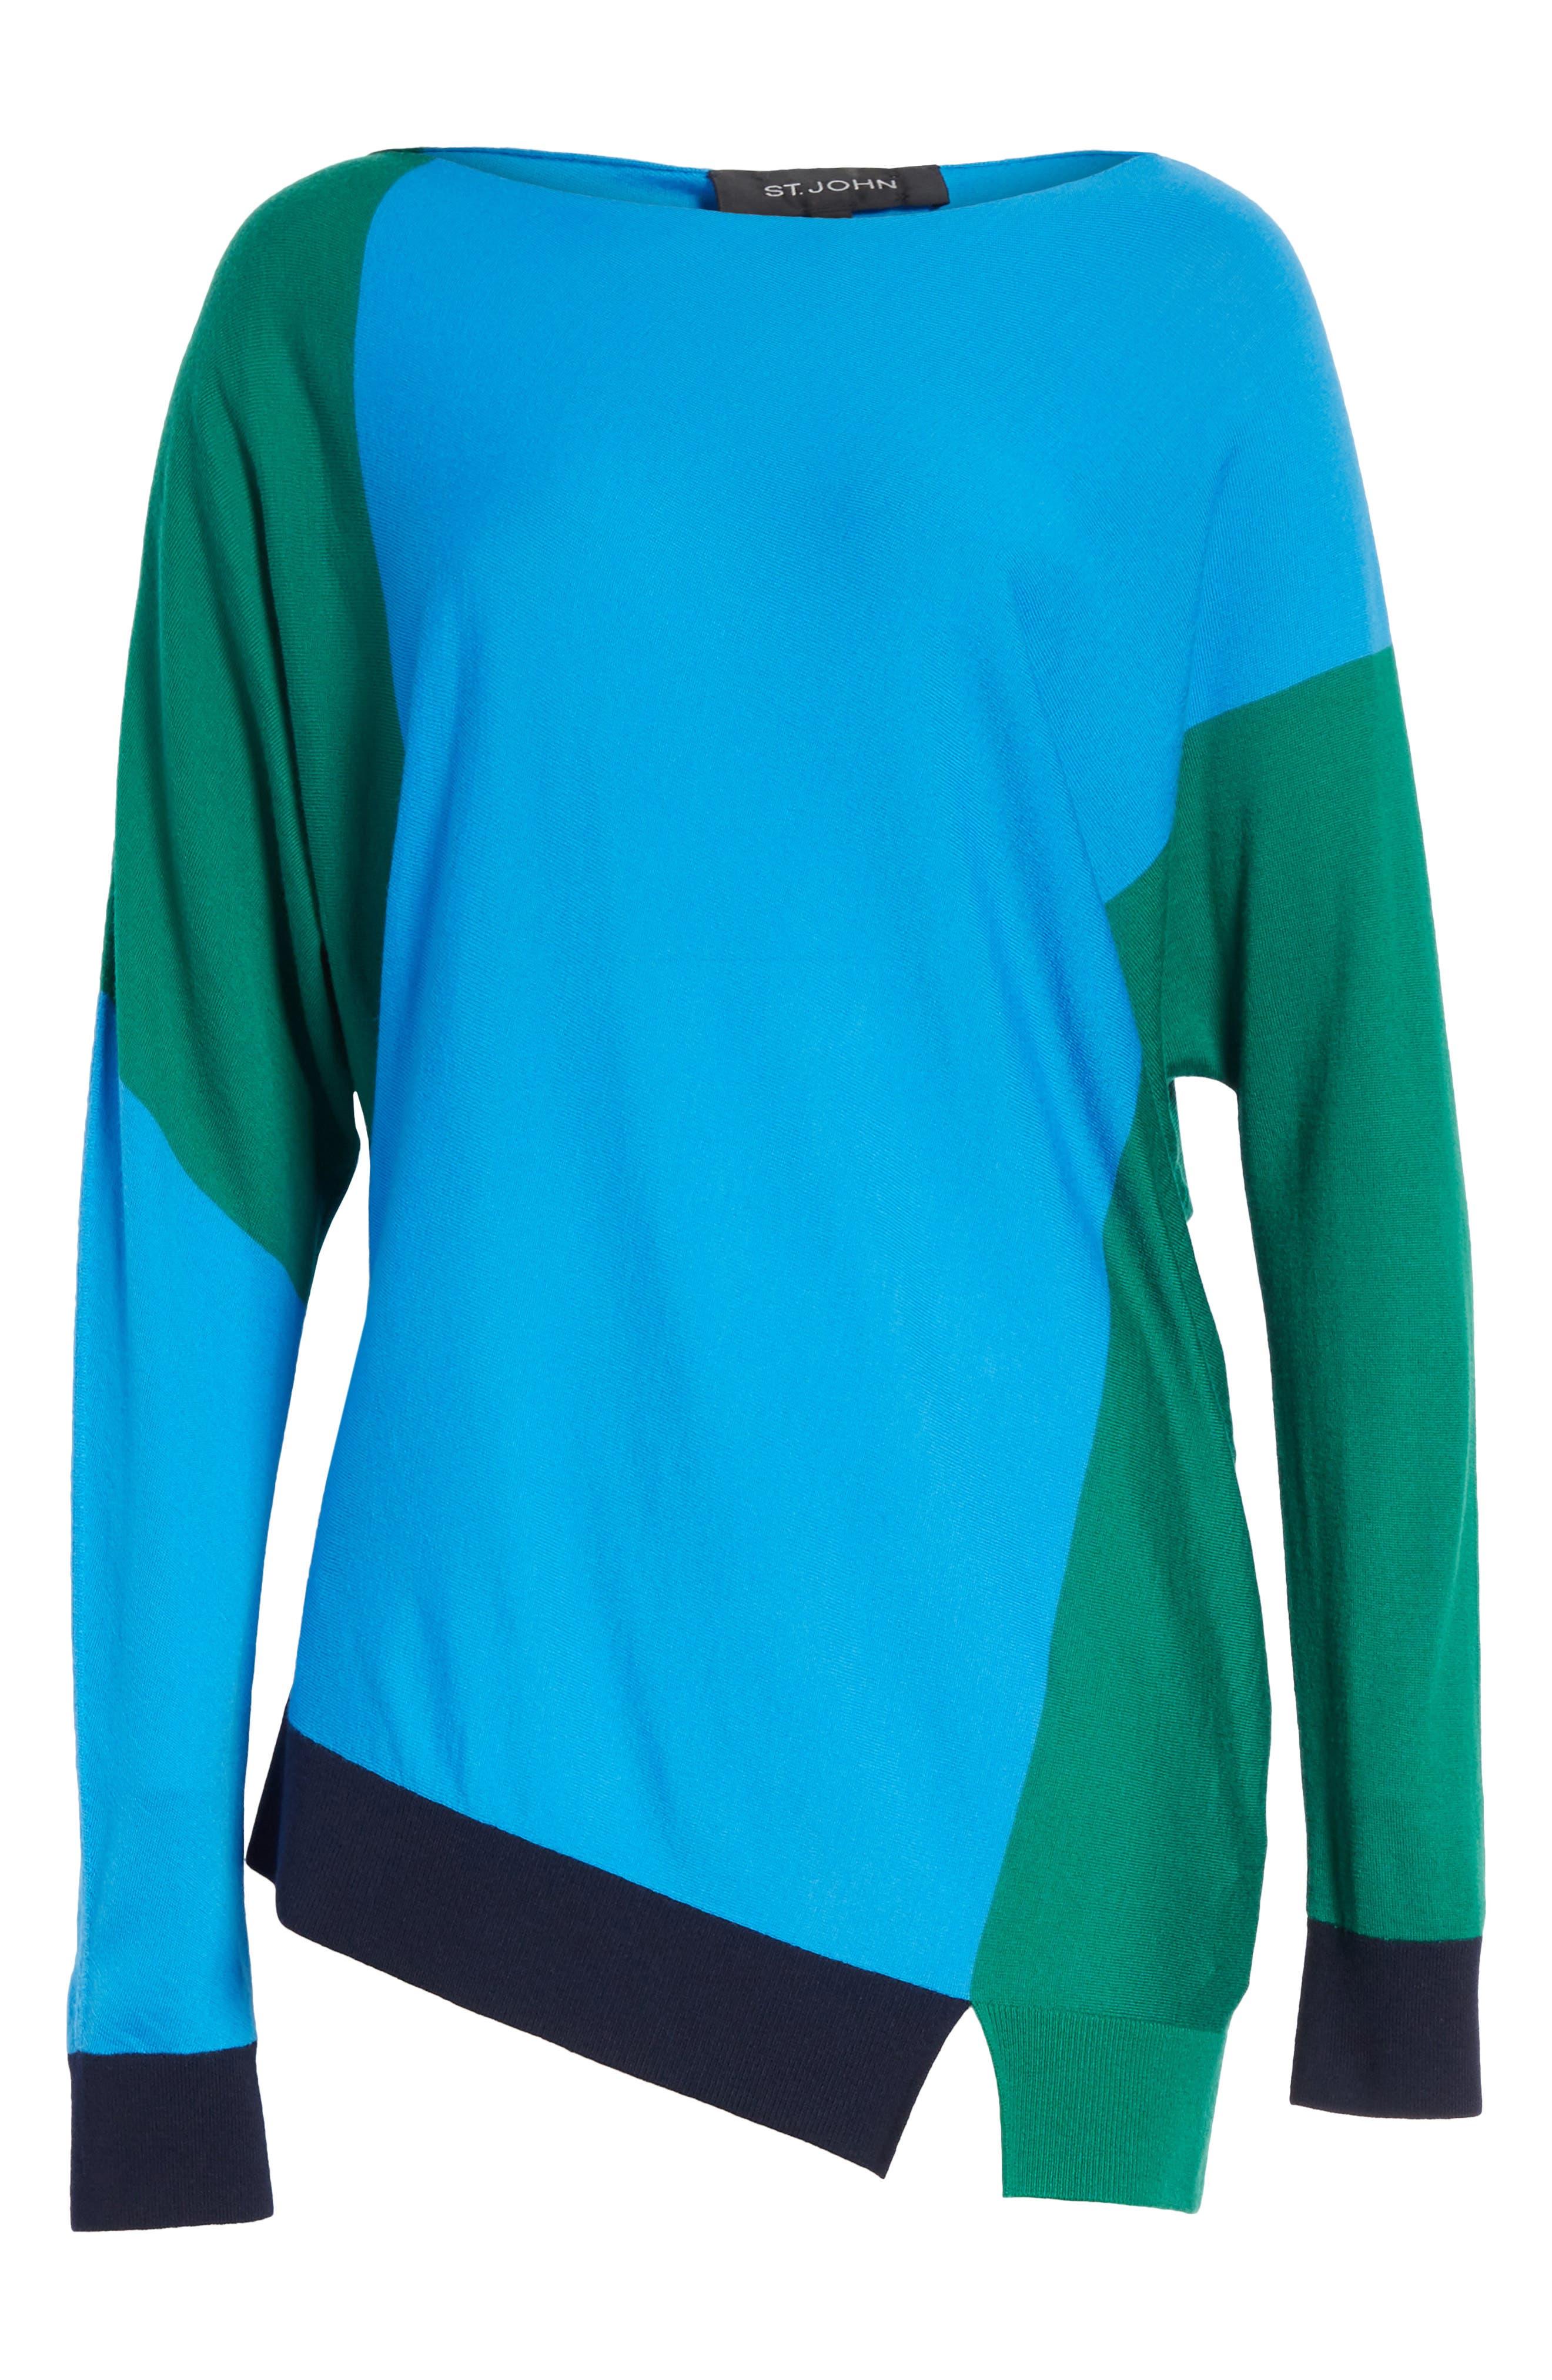 Colorblock Knit Wool Sweater,                             Alternate thumbnail 6, color,                             Cyan/ Emerald/ Navy